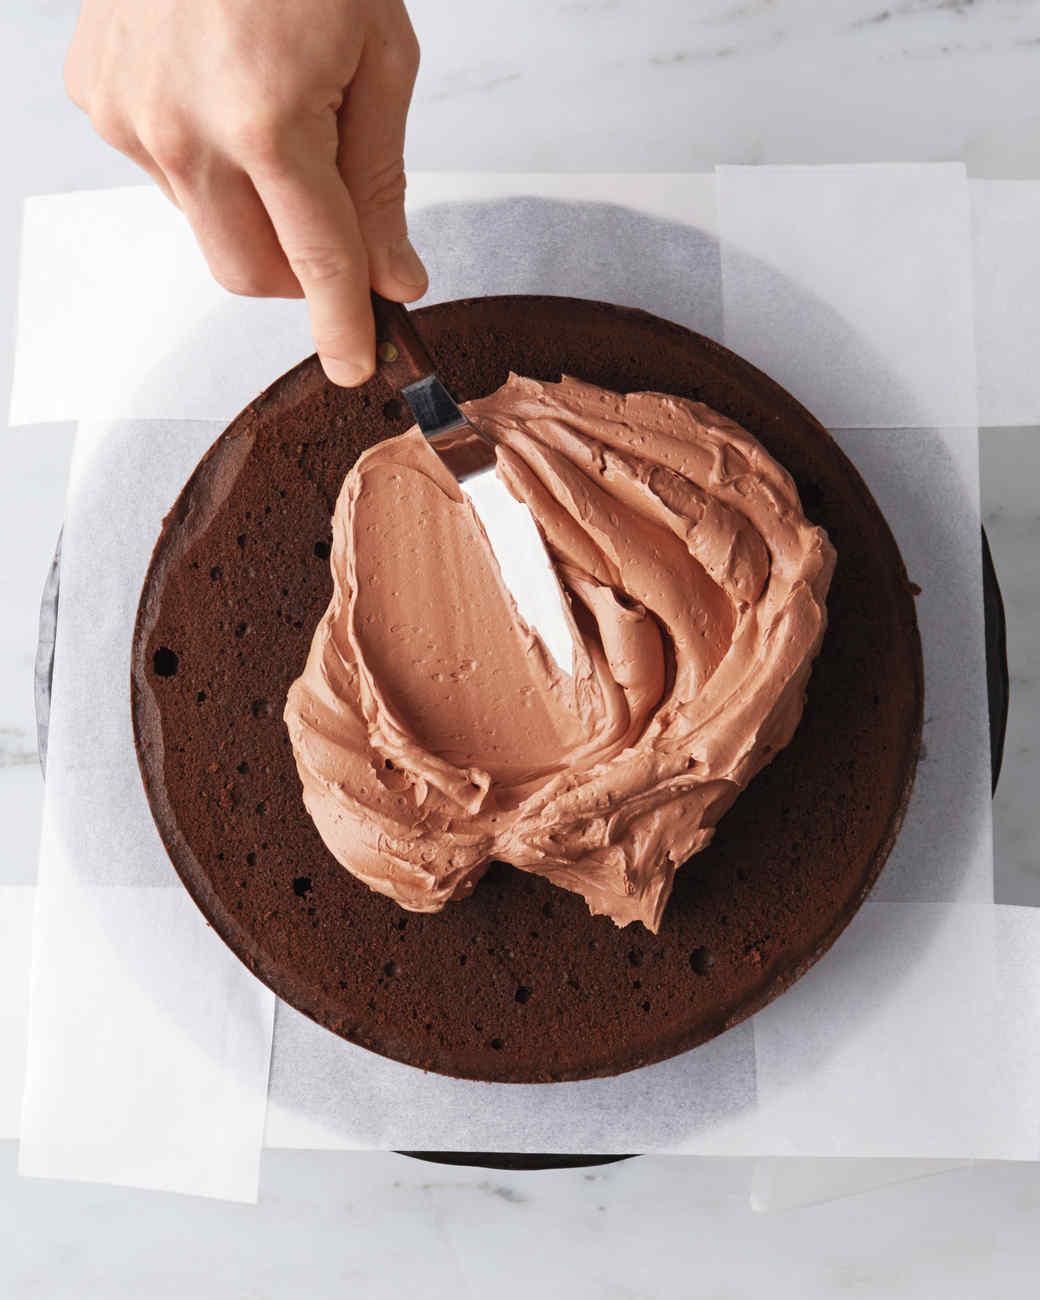 devils-food-cake-process-279-d112204.jpg